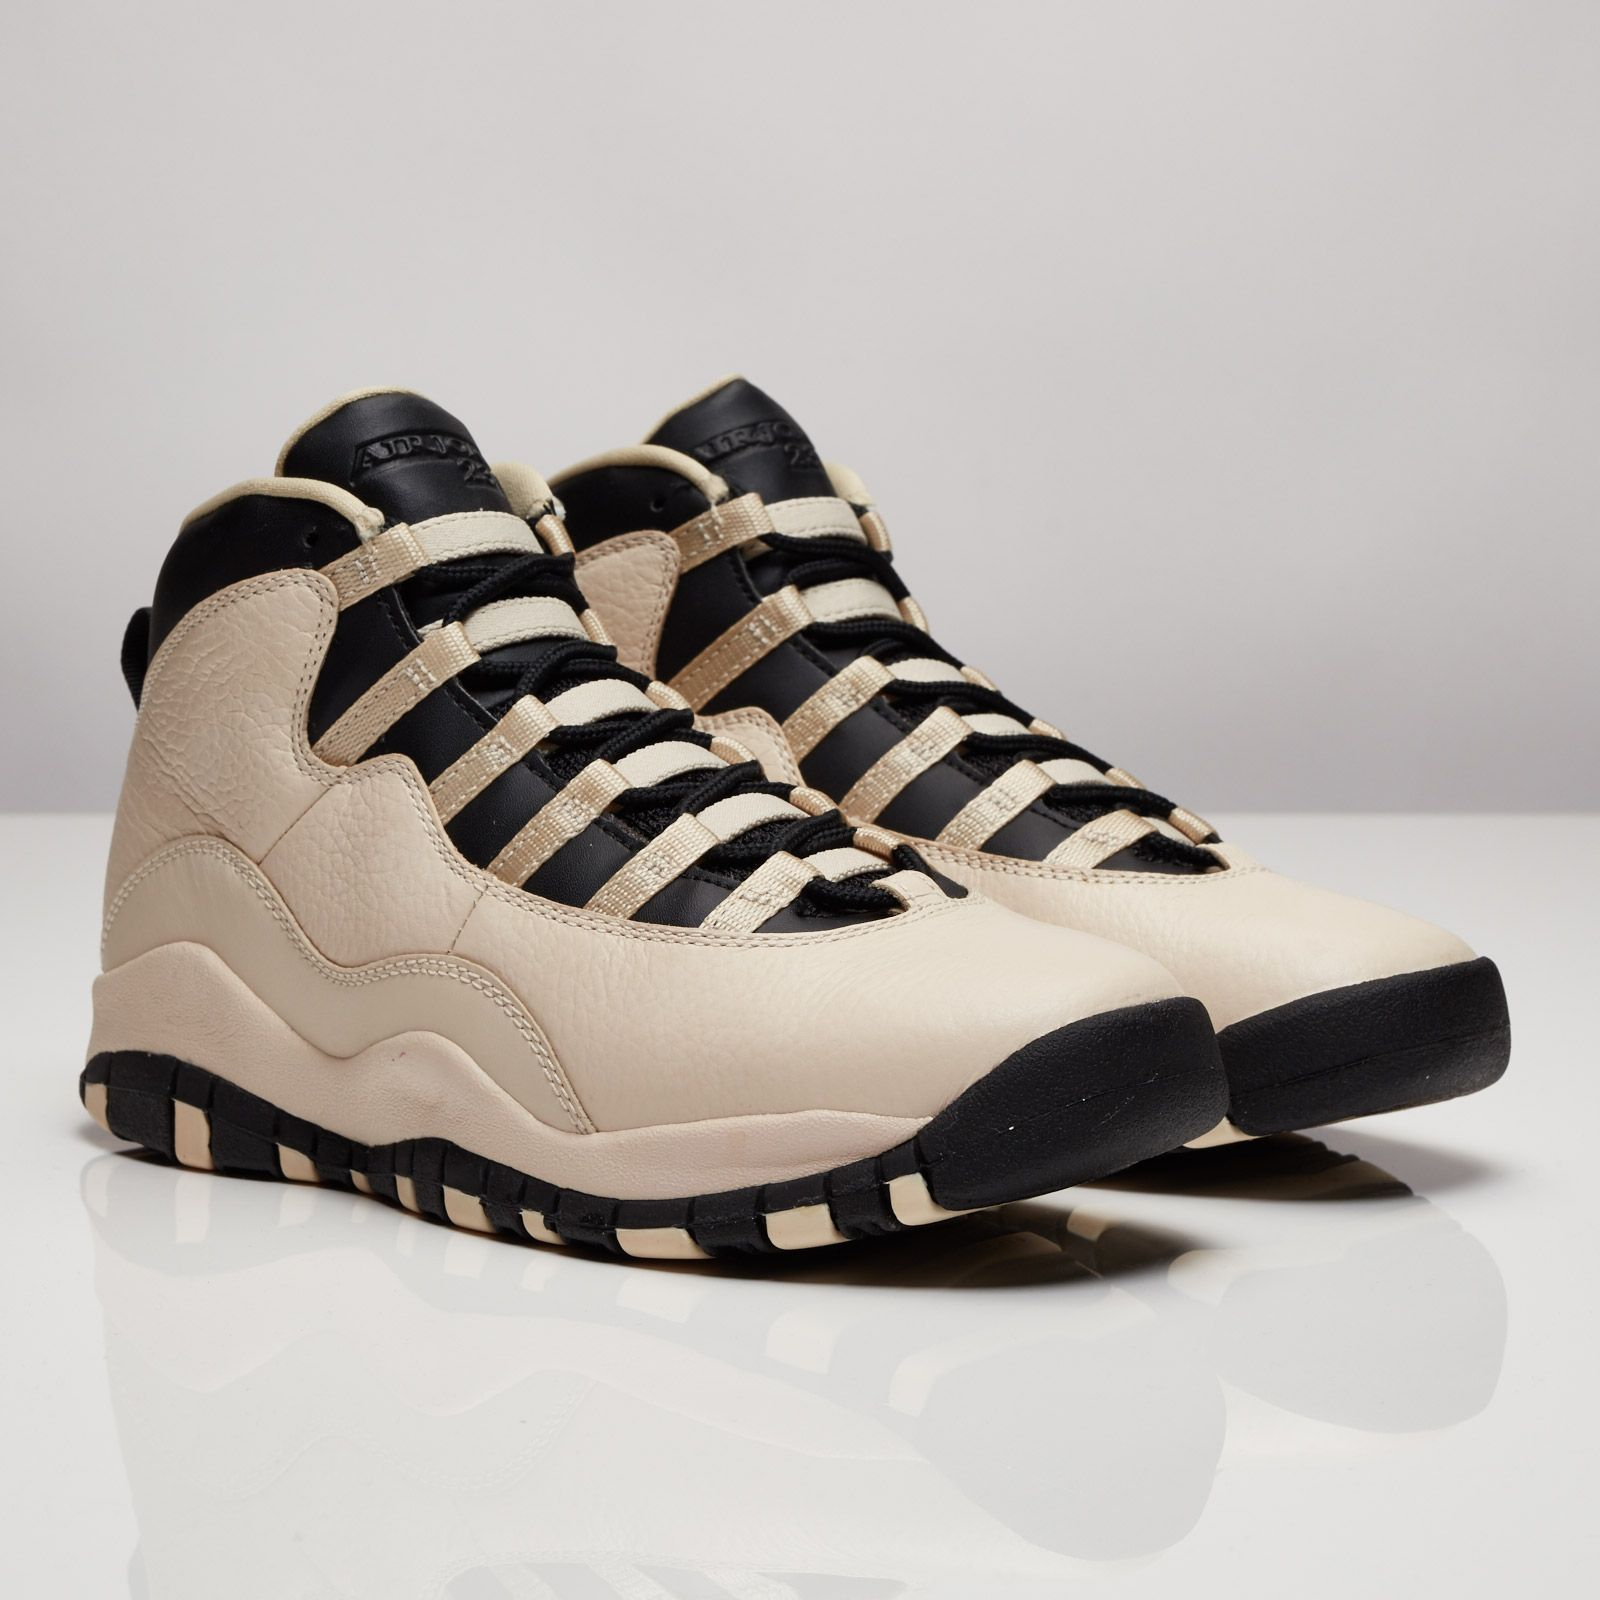 air jordan 10 basketball shoes